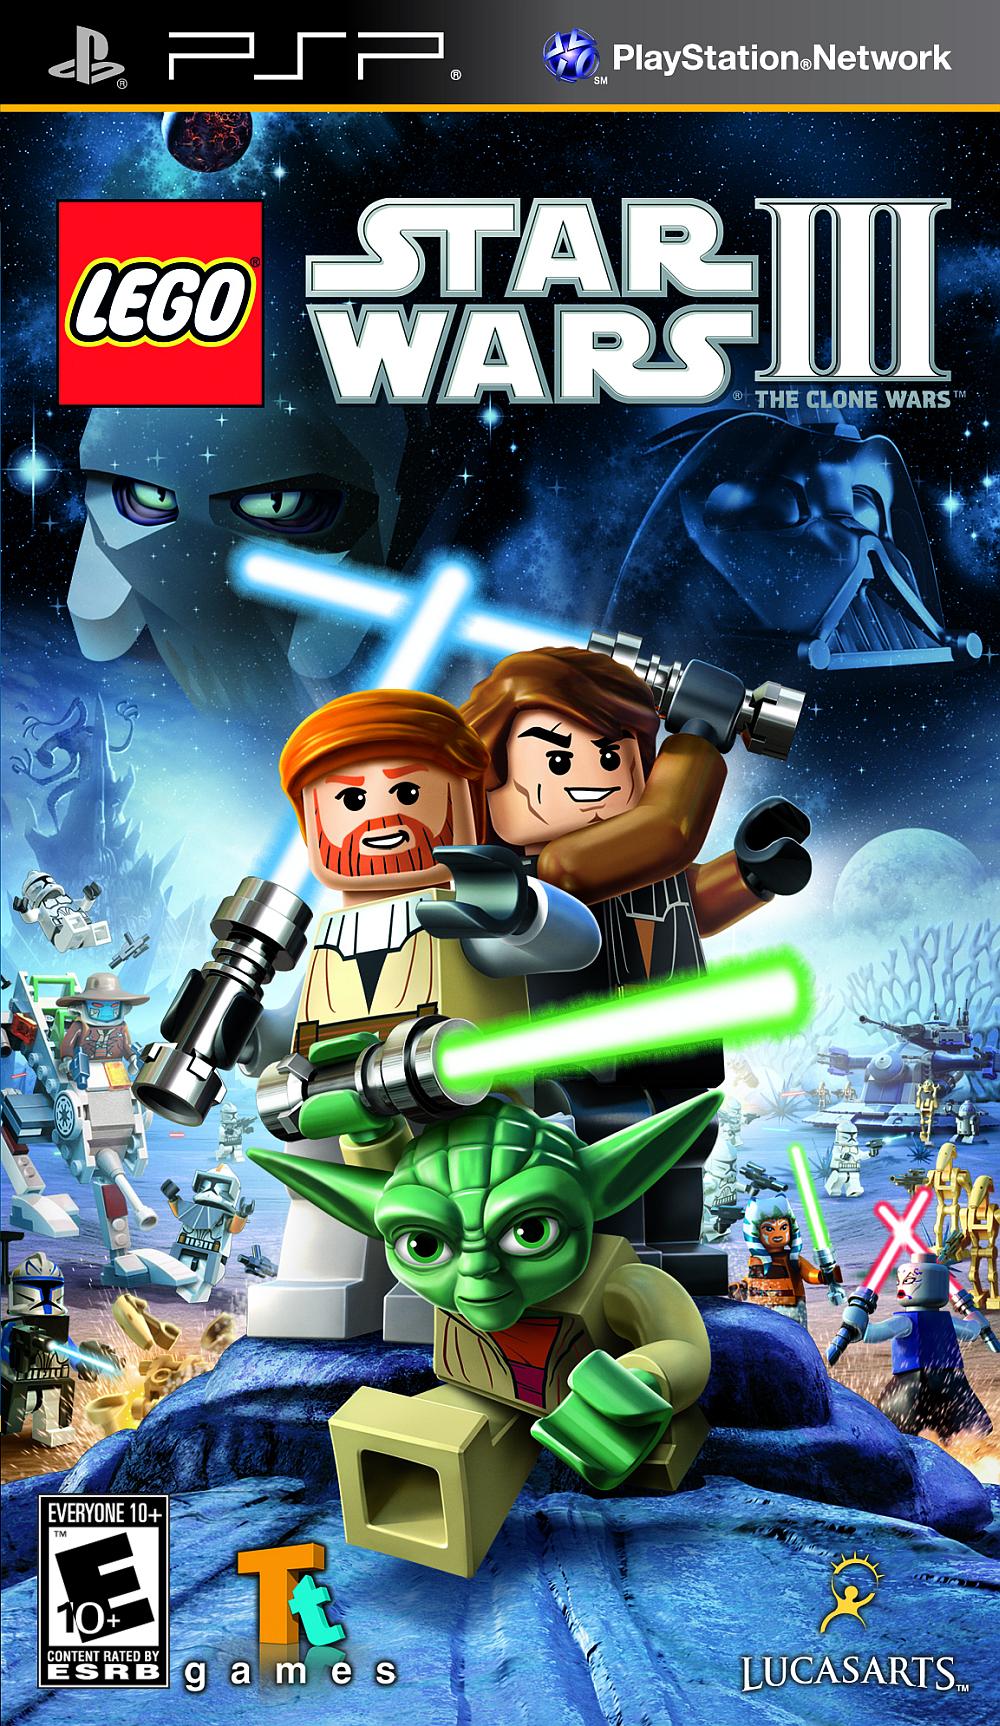 lego star wars iii the clone wars wallpaper 13